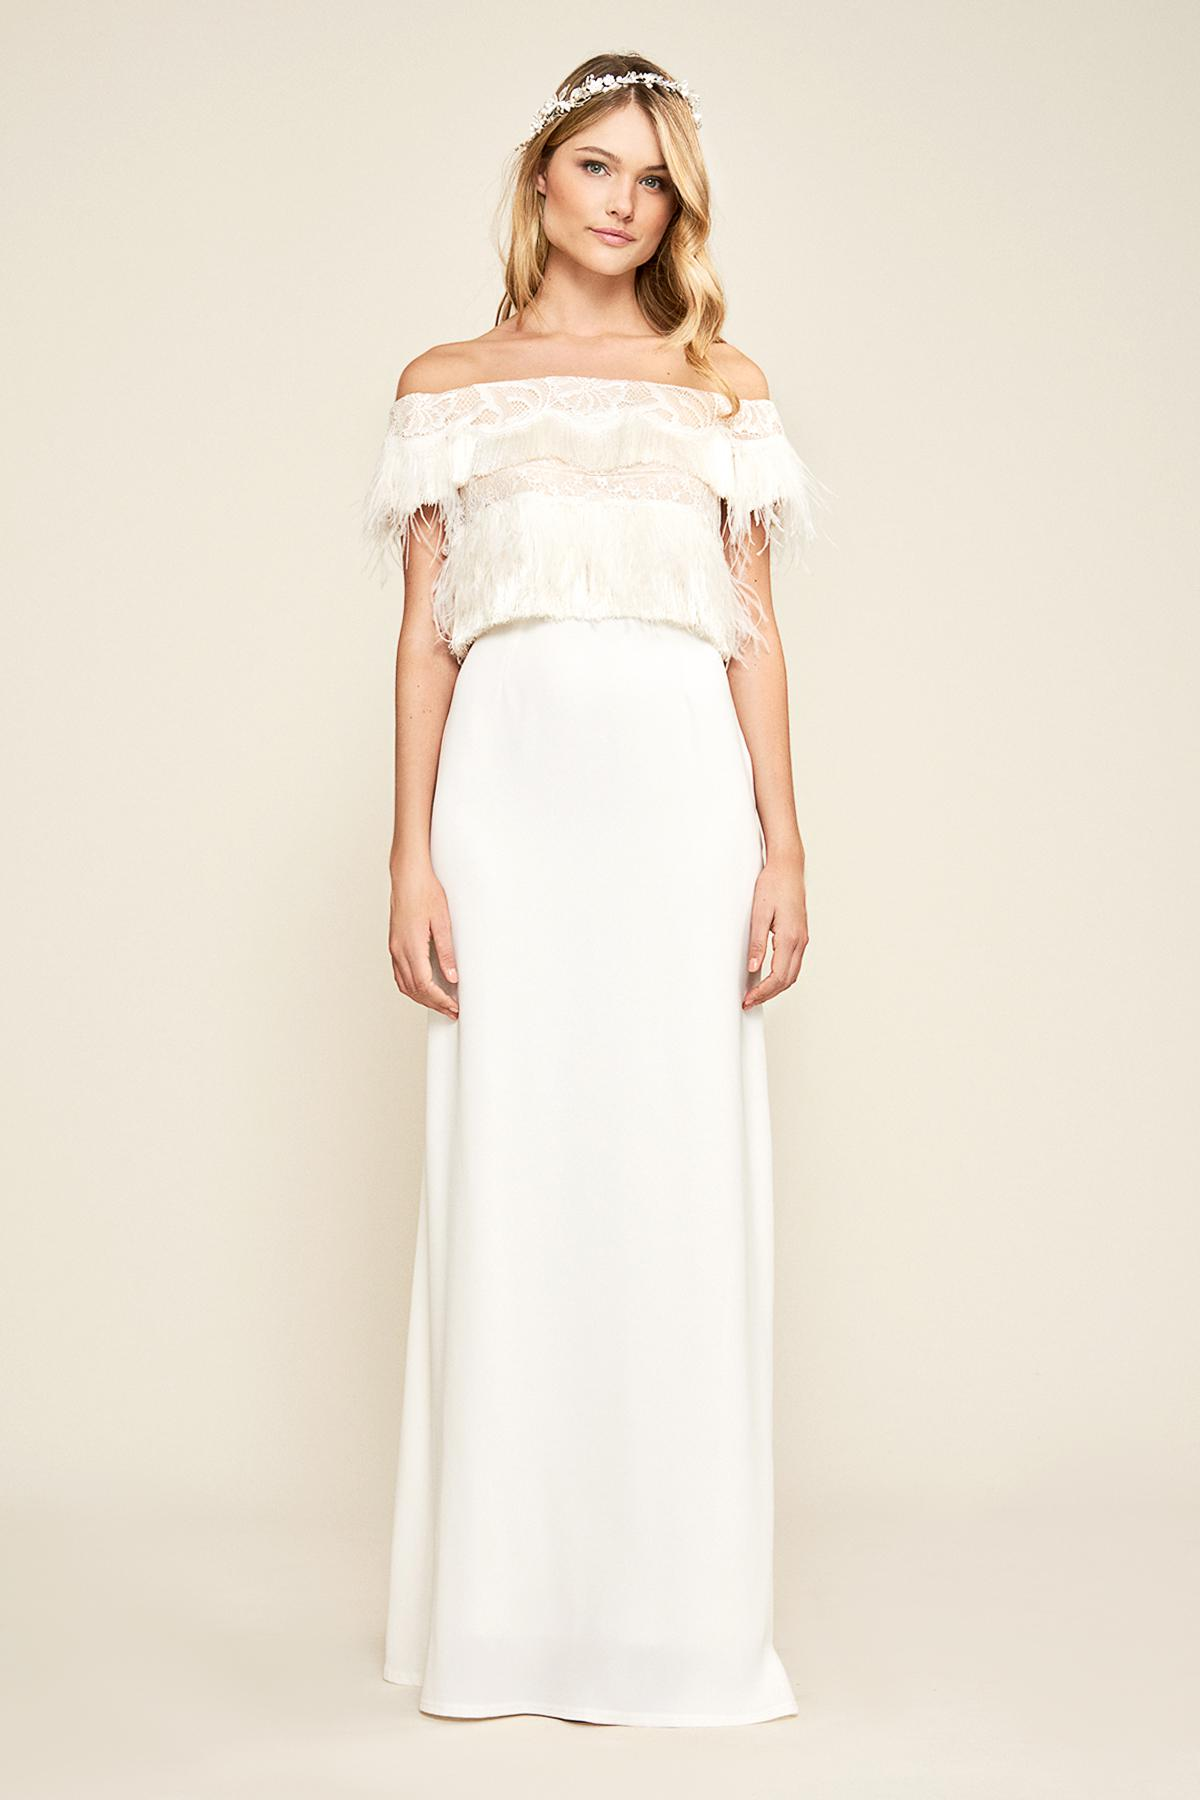 03472d2f2bd Tadashi Shoji Janessa Off-the-shoulder Gown in White - Lyst